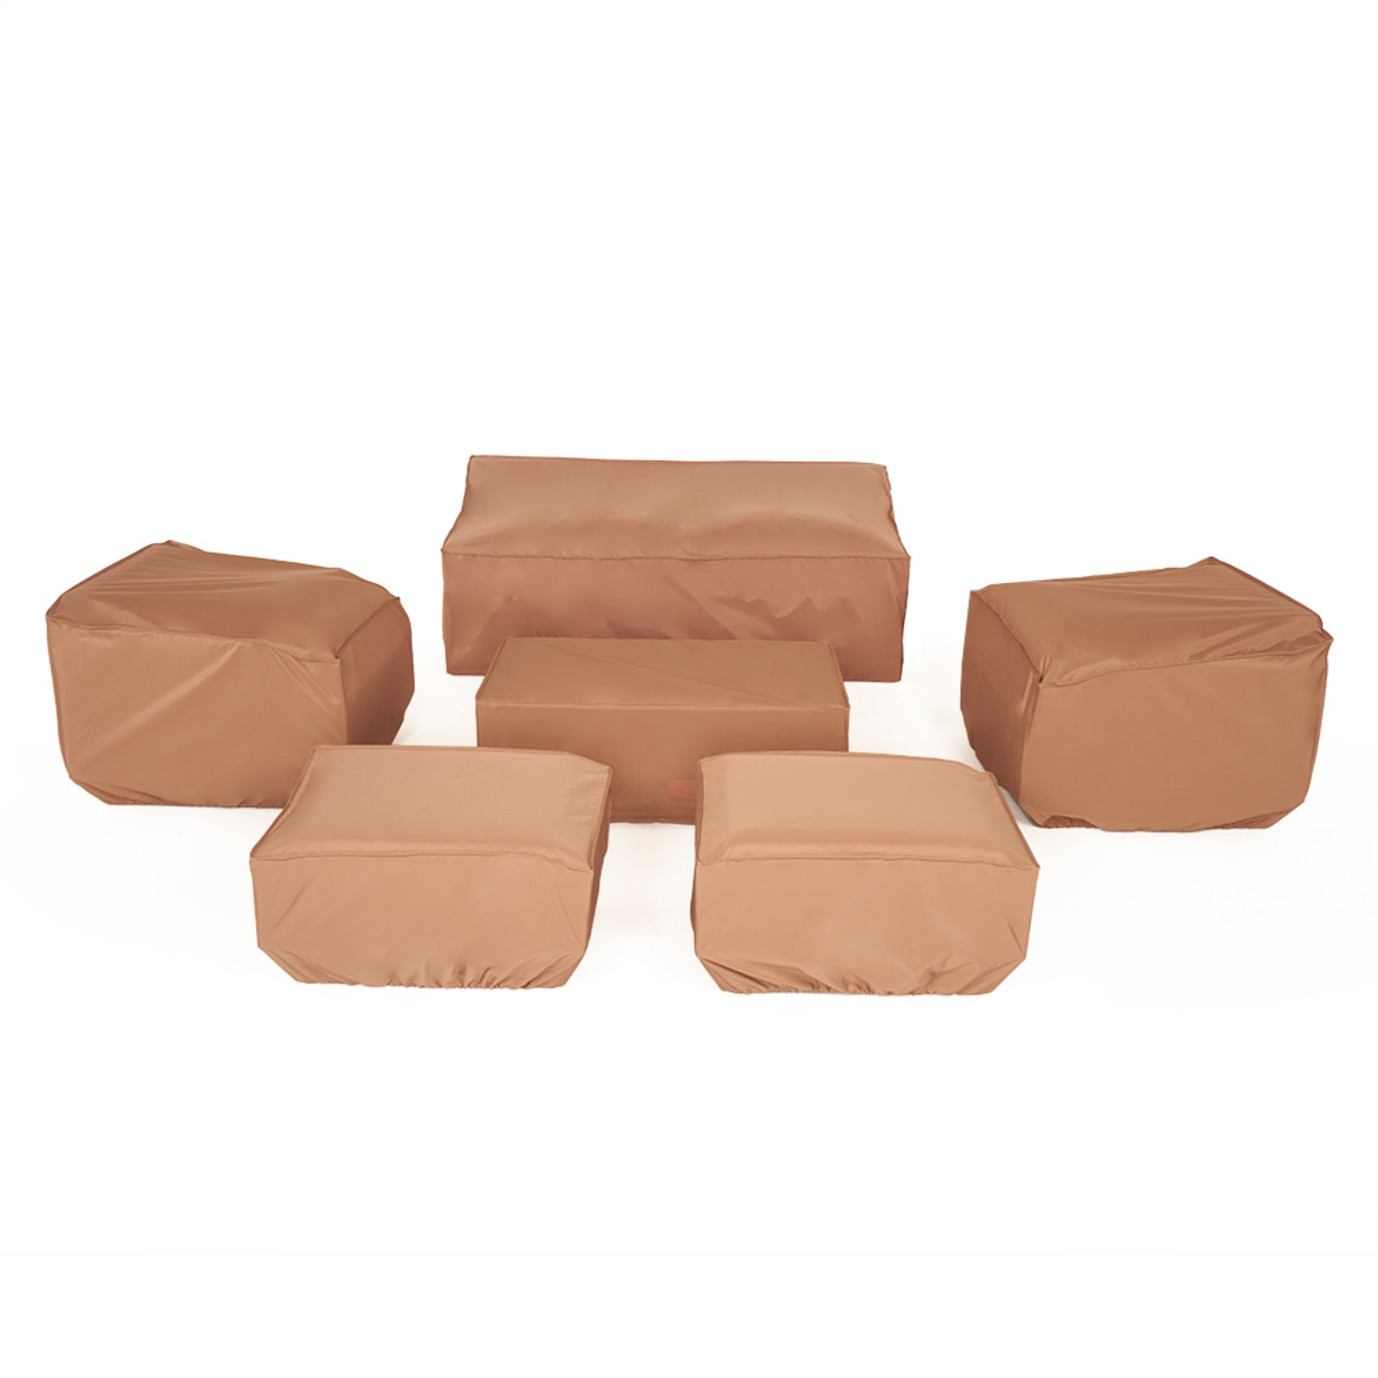 Vistano™ 7pc Deep Seating Furniture Cover Set